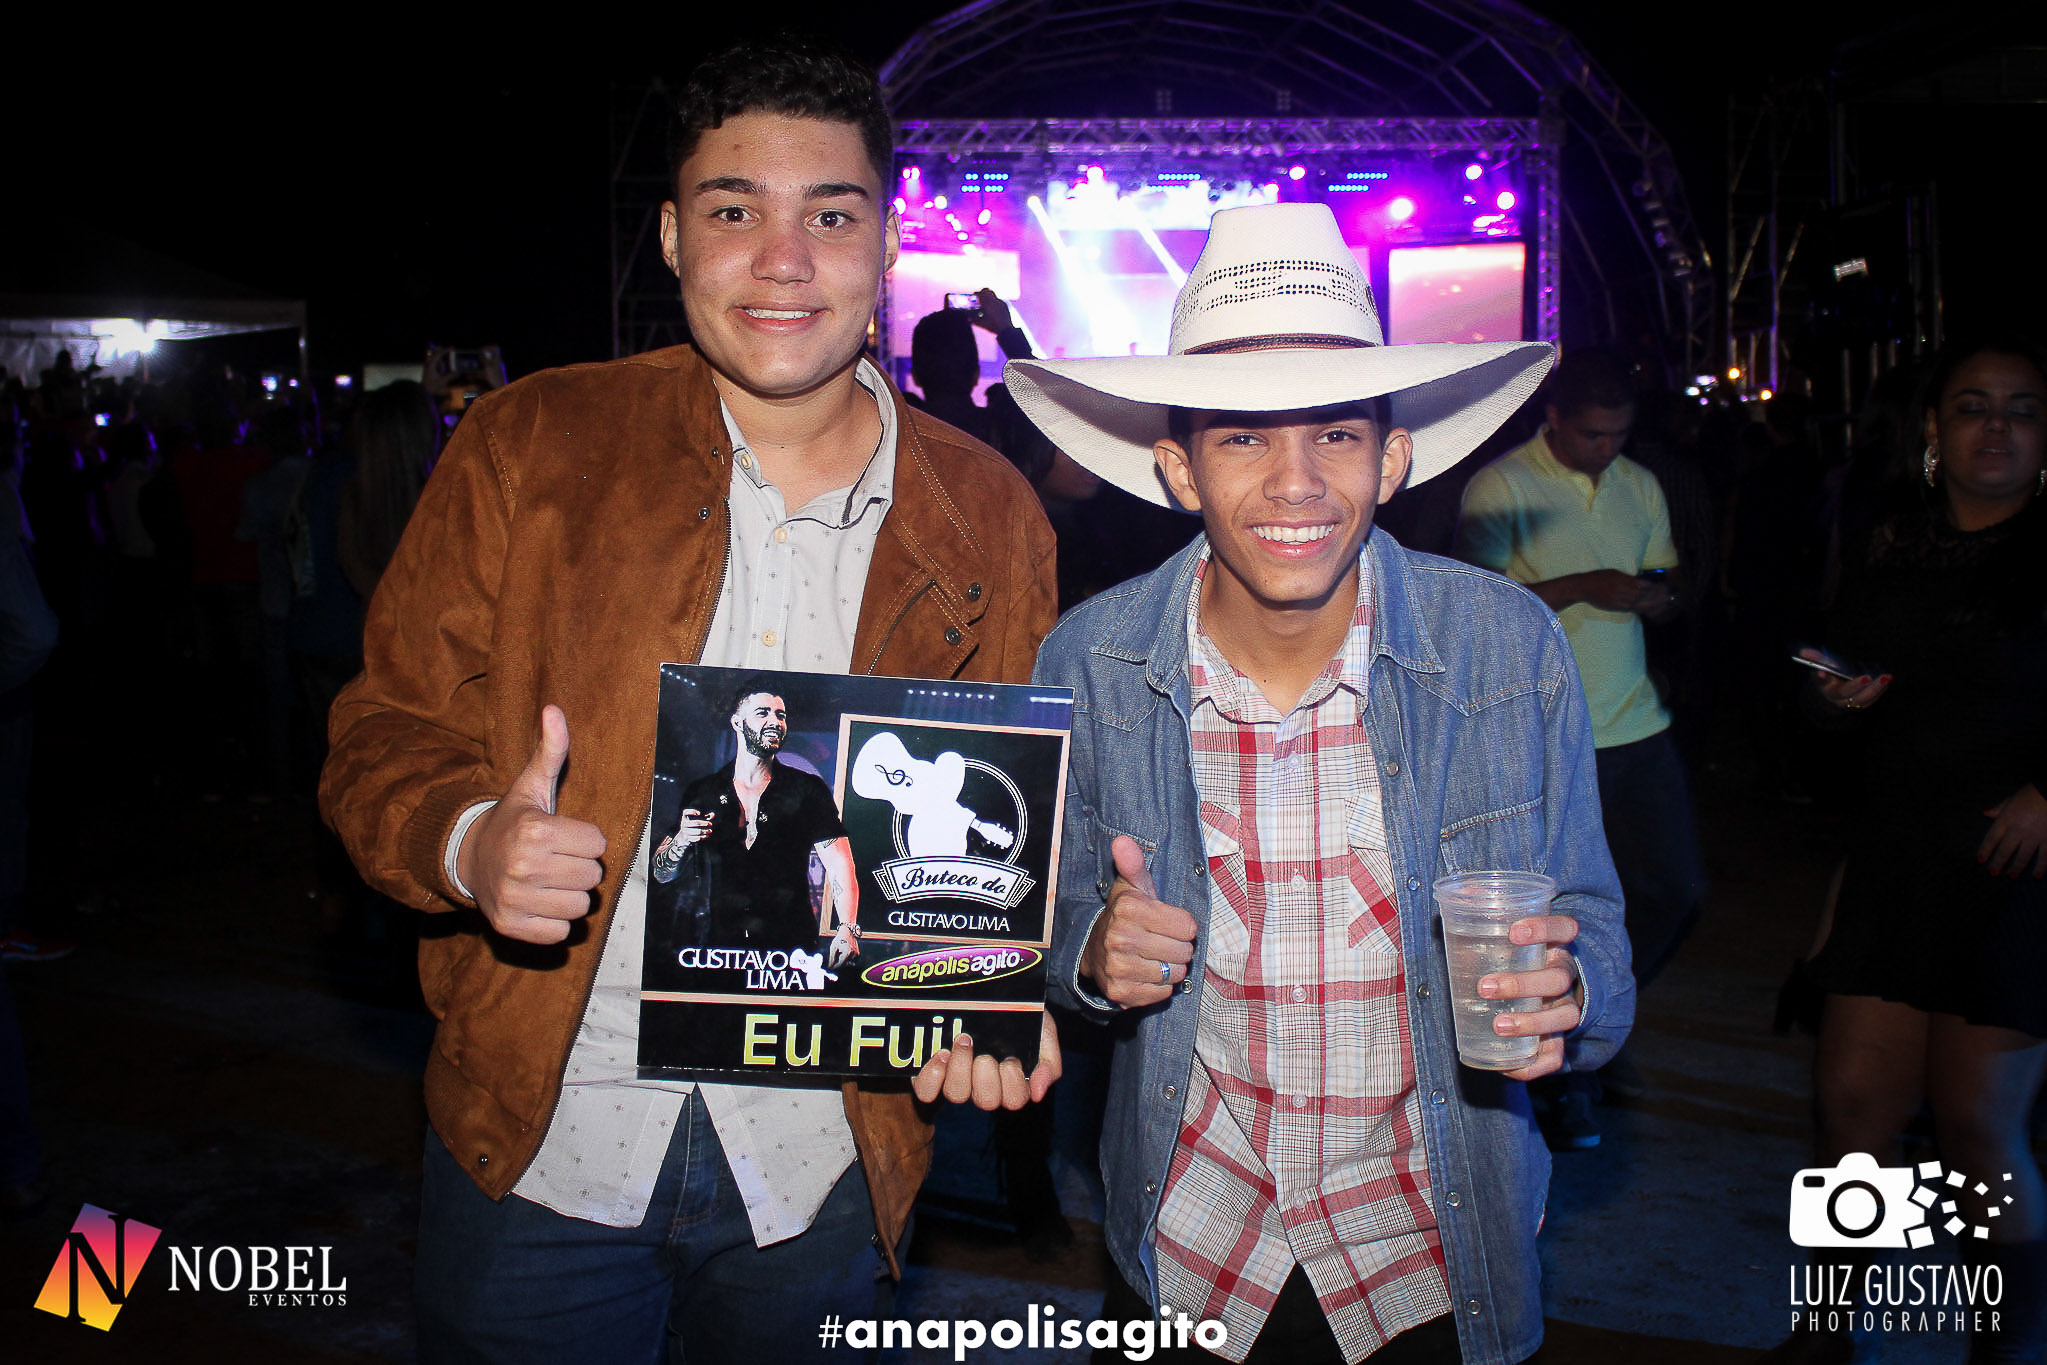 Luiz Gustavo Photographer-228